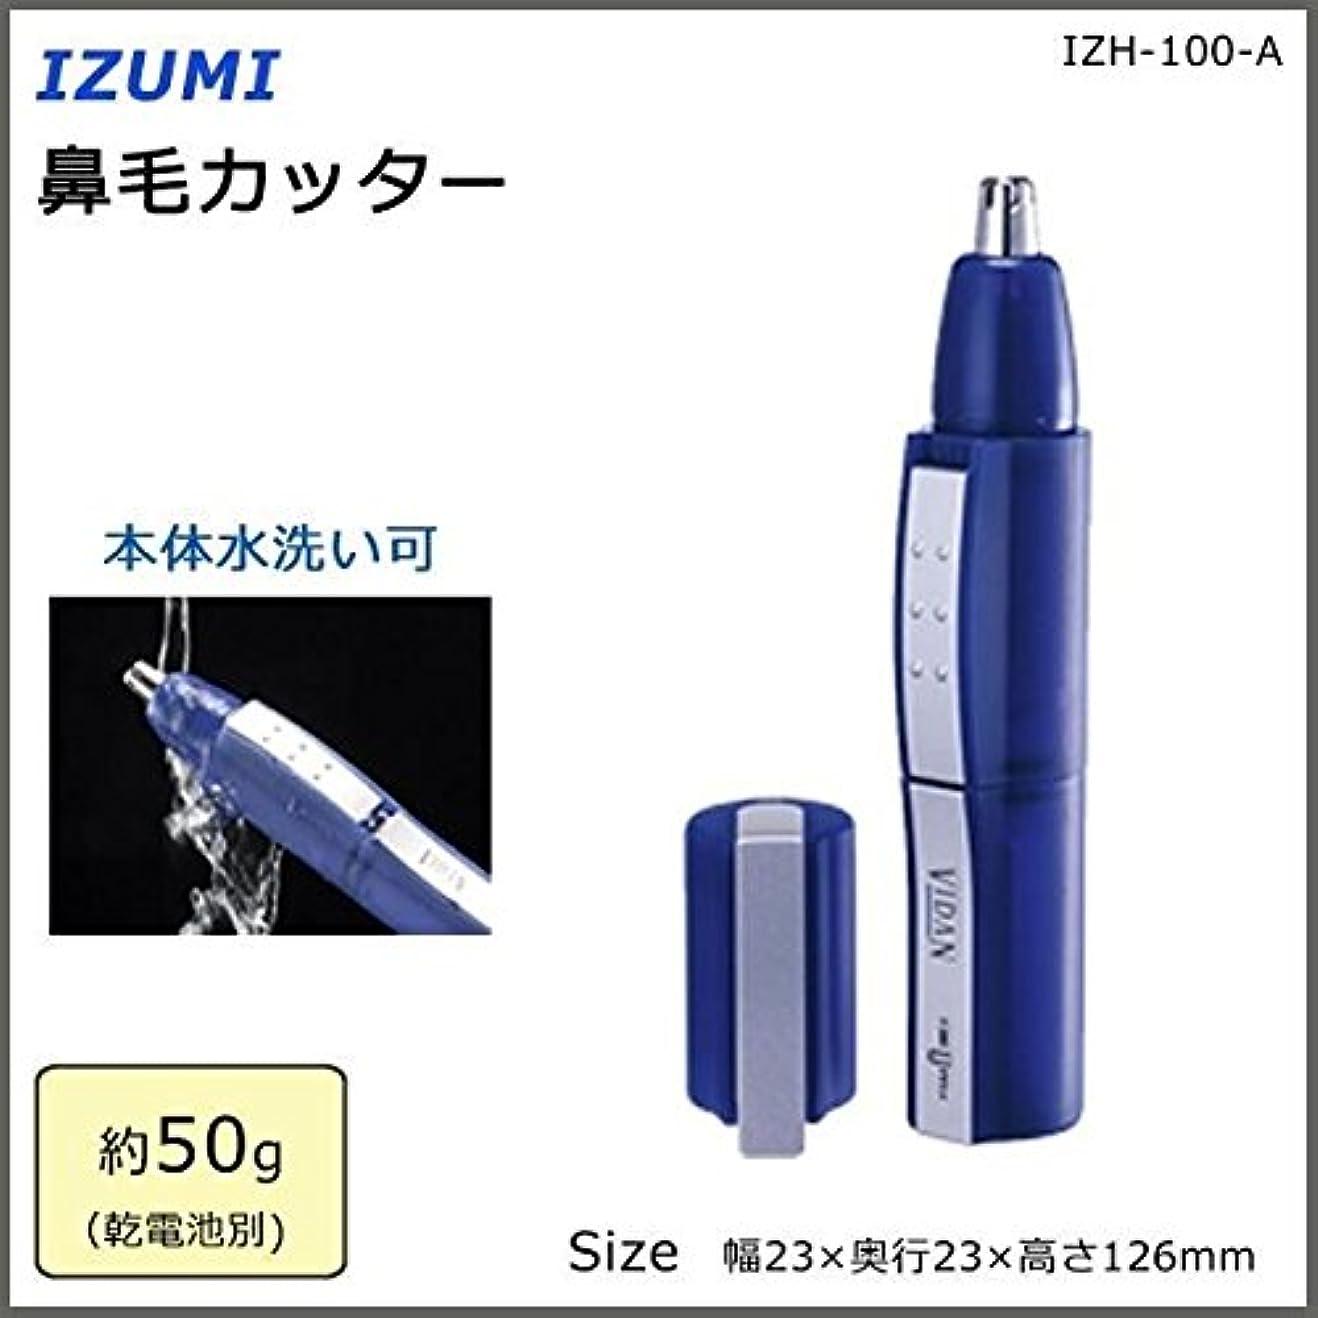 失効帽子犯罪IZUMI 鼻毛カッター IZH-100-A